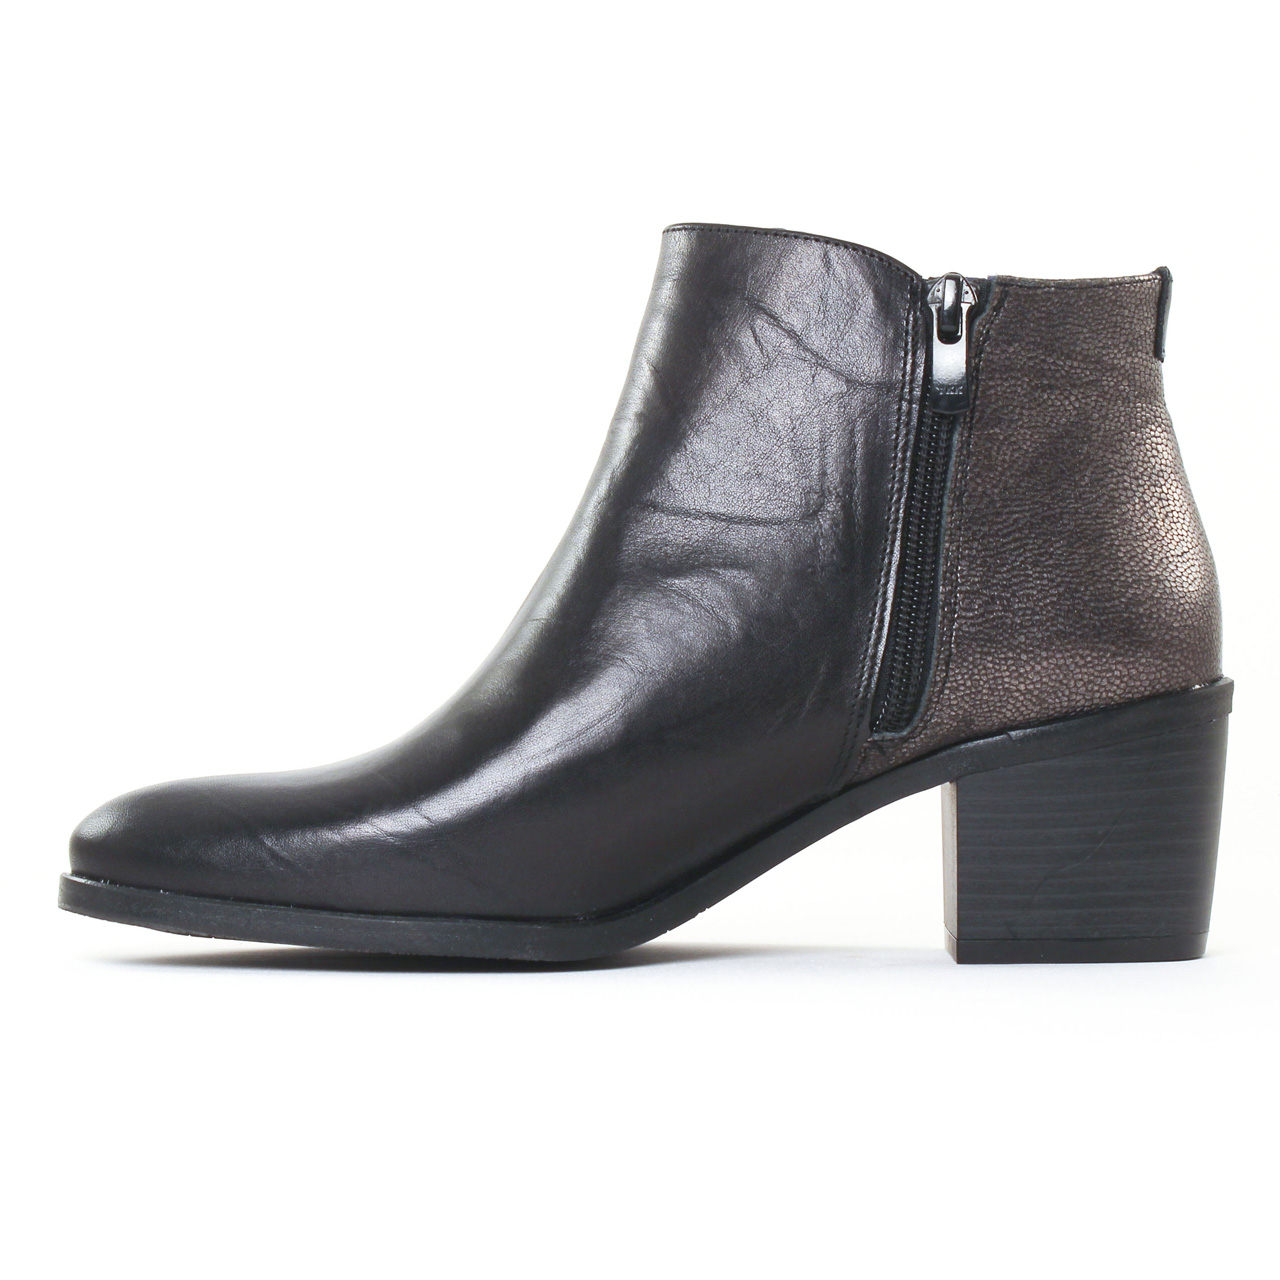 dorking cora 6943 noir boot talon noir bronze automne. Black Bedroom Furniture Sets. Home Design Ideas